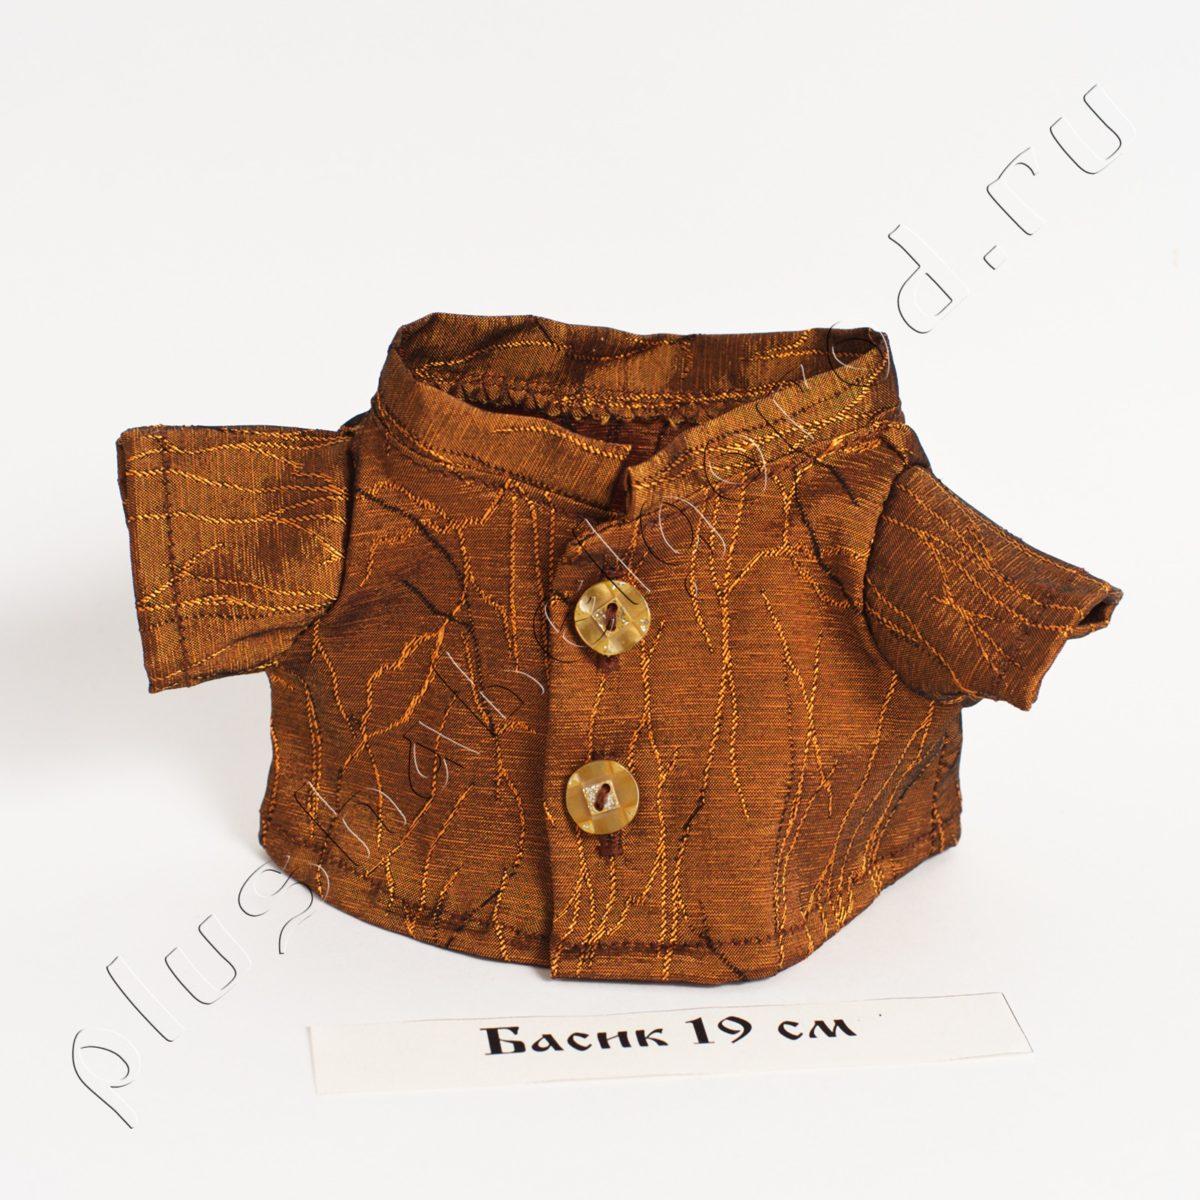 Рубашка коричневая Для Басика 19 см